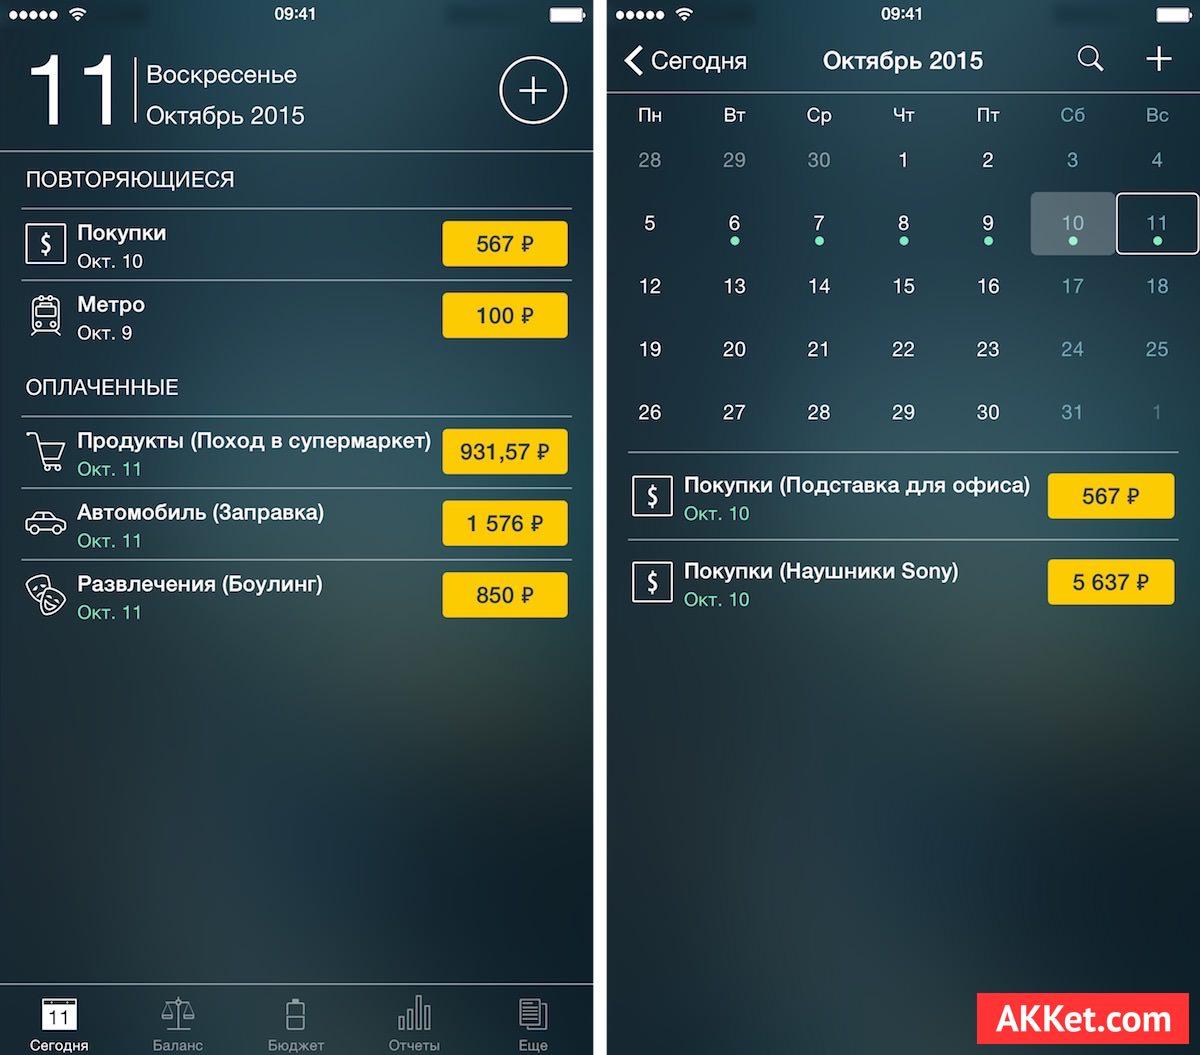 Money Pro akket.com review iOS os x mac iPhone iPad macbook imac pro iPhone 6s plus app store 3